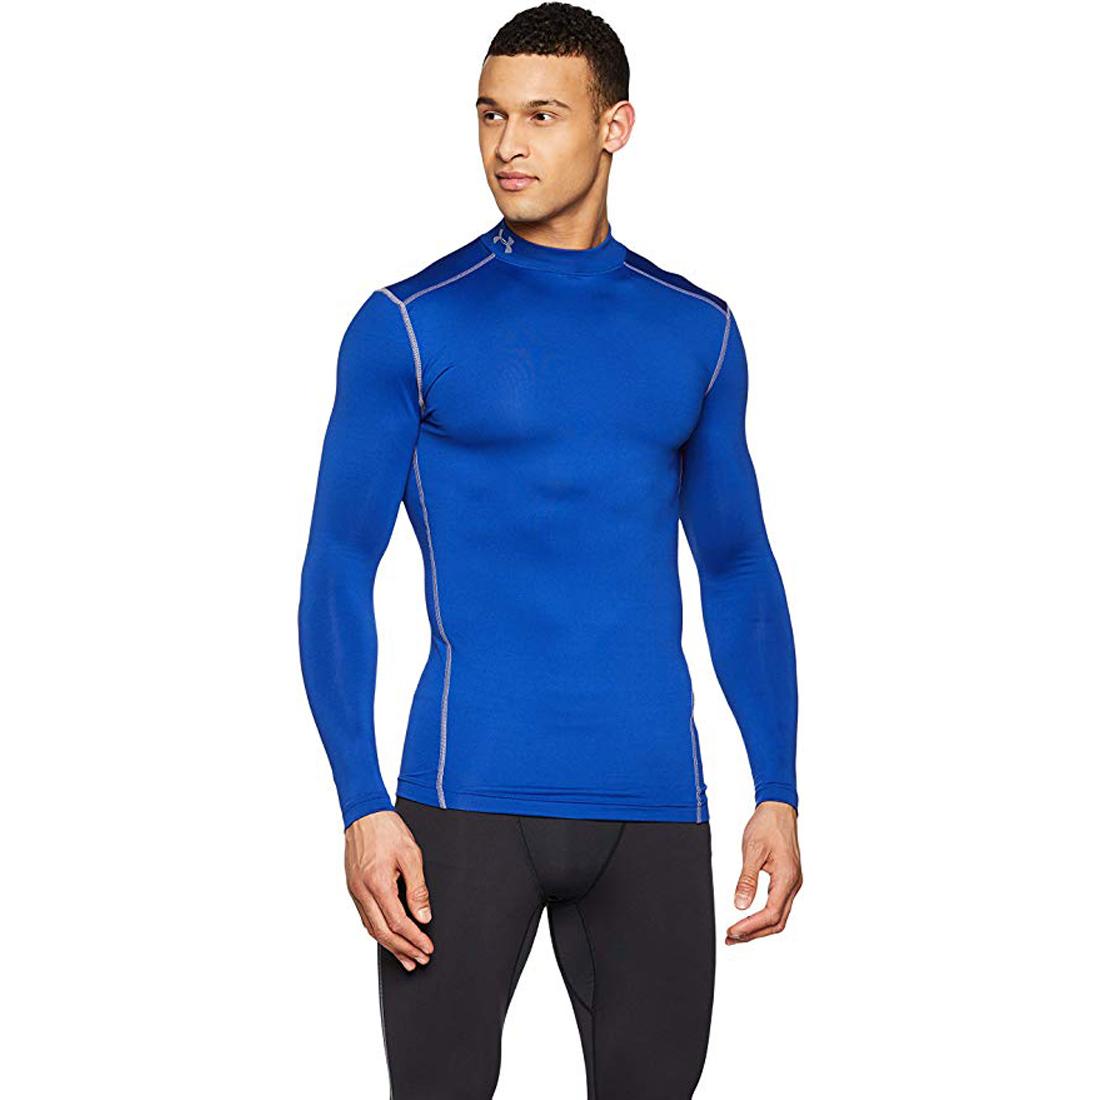 Under Armour Mens ColdGear Compression Mock Long Sleeve T-Shirt